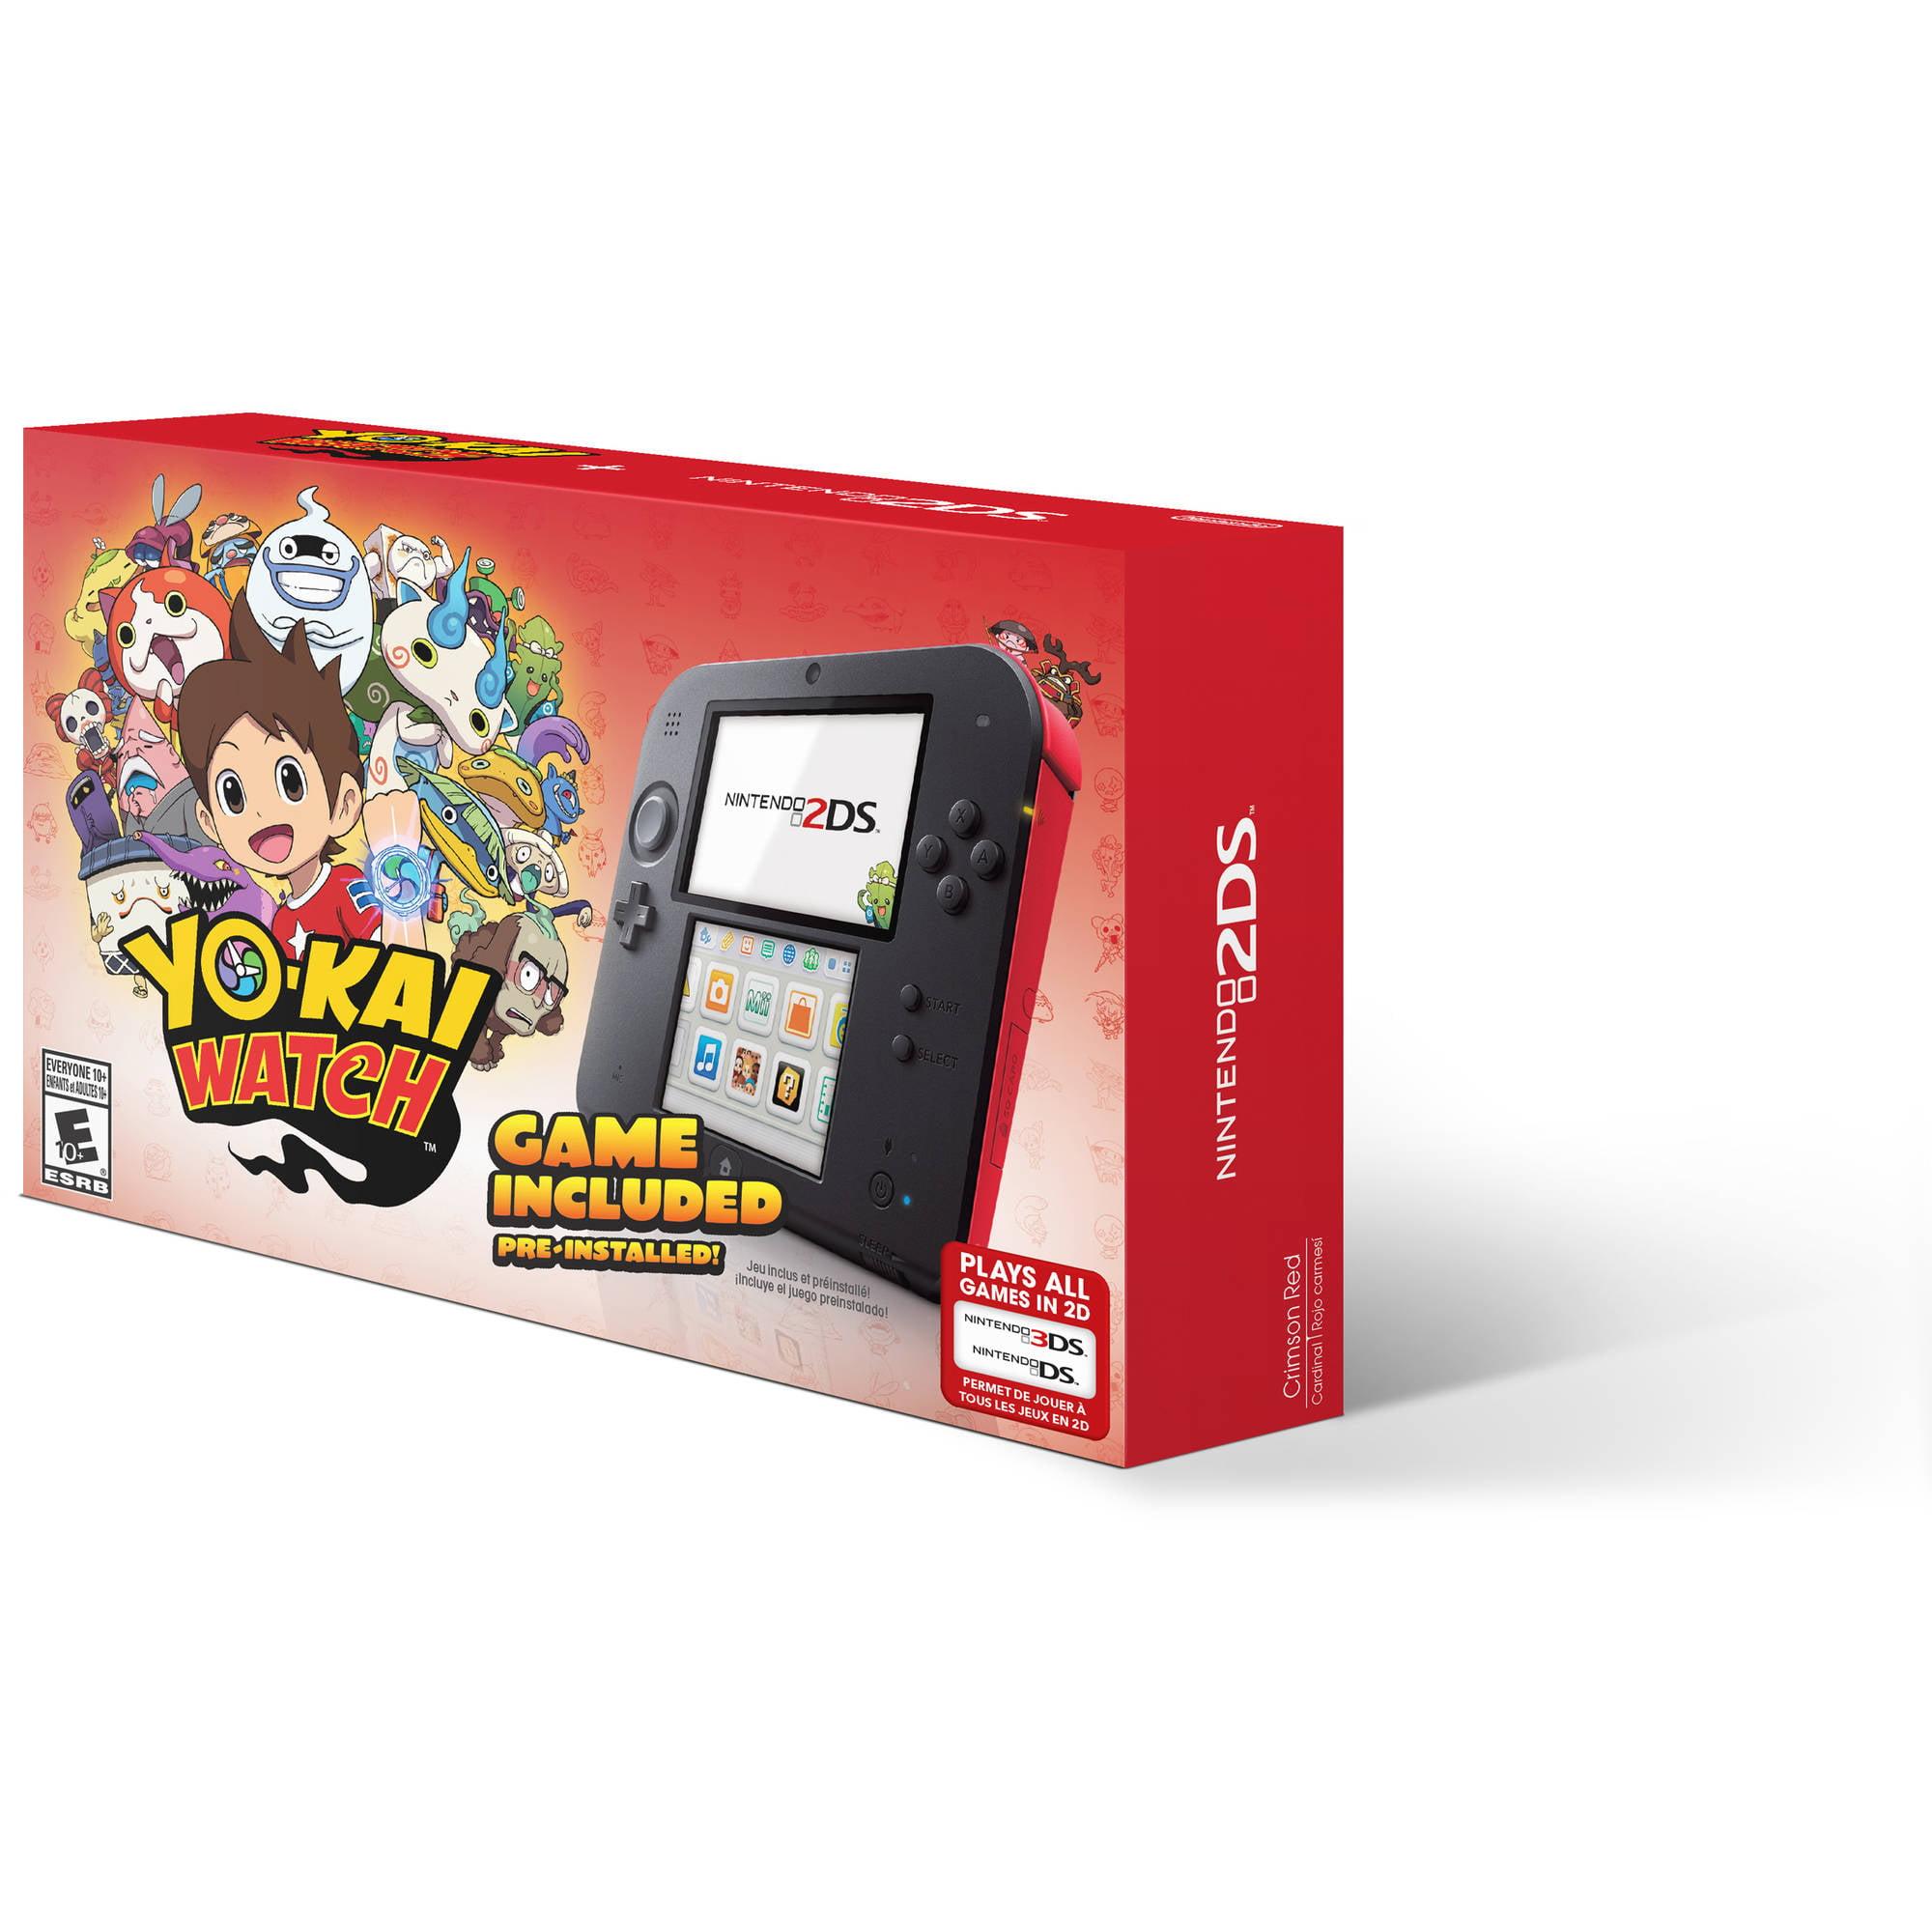 Nintendo 2DS with Yo-Kai Watch Game, Red